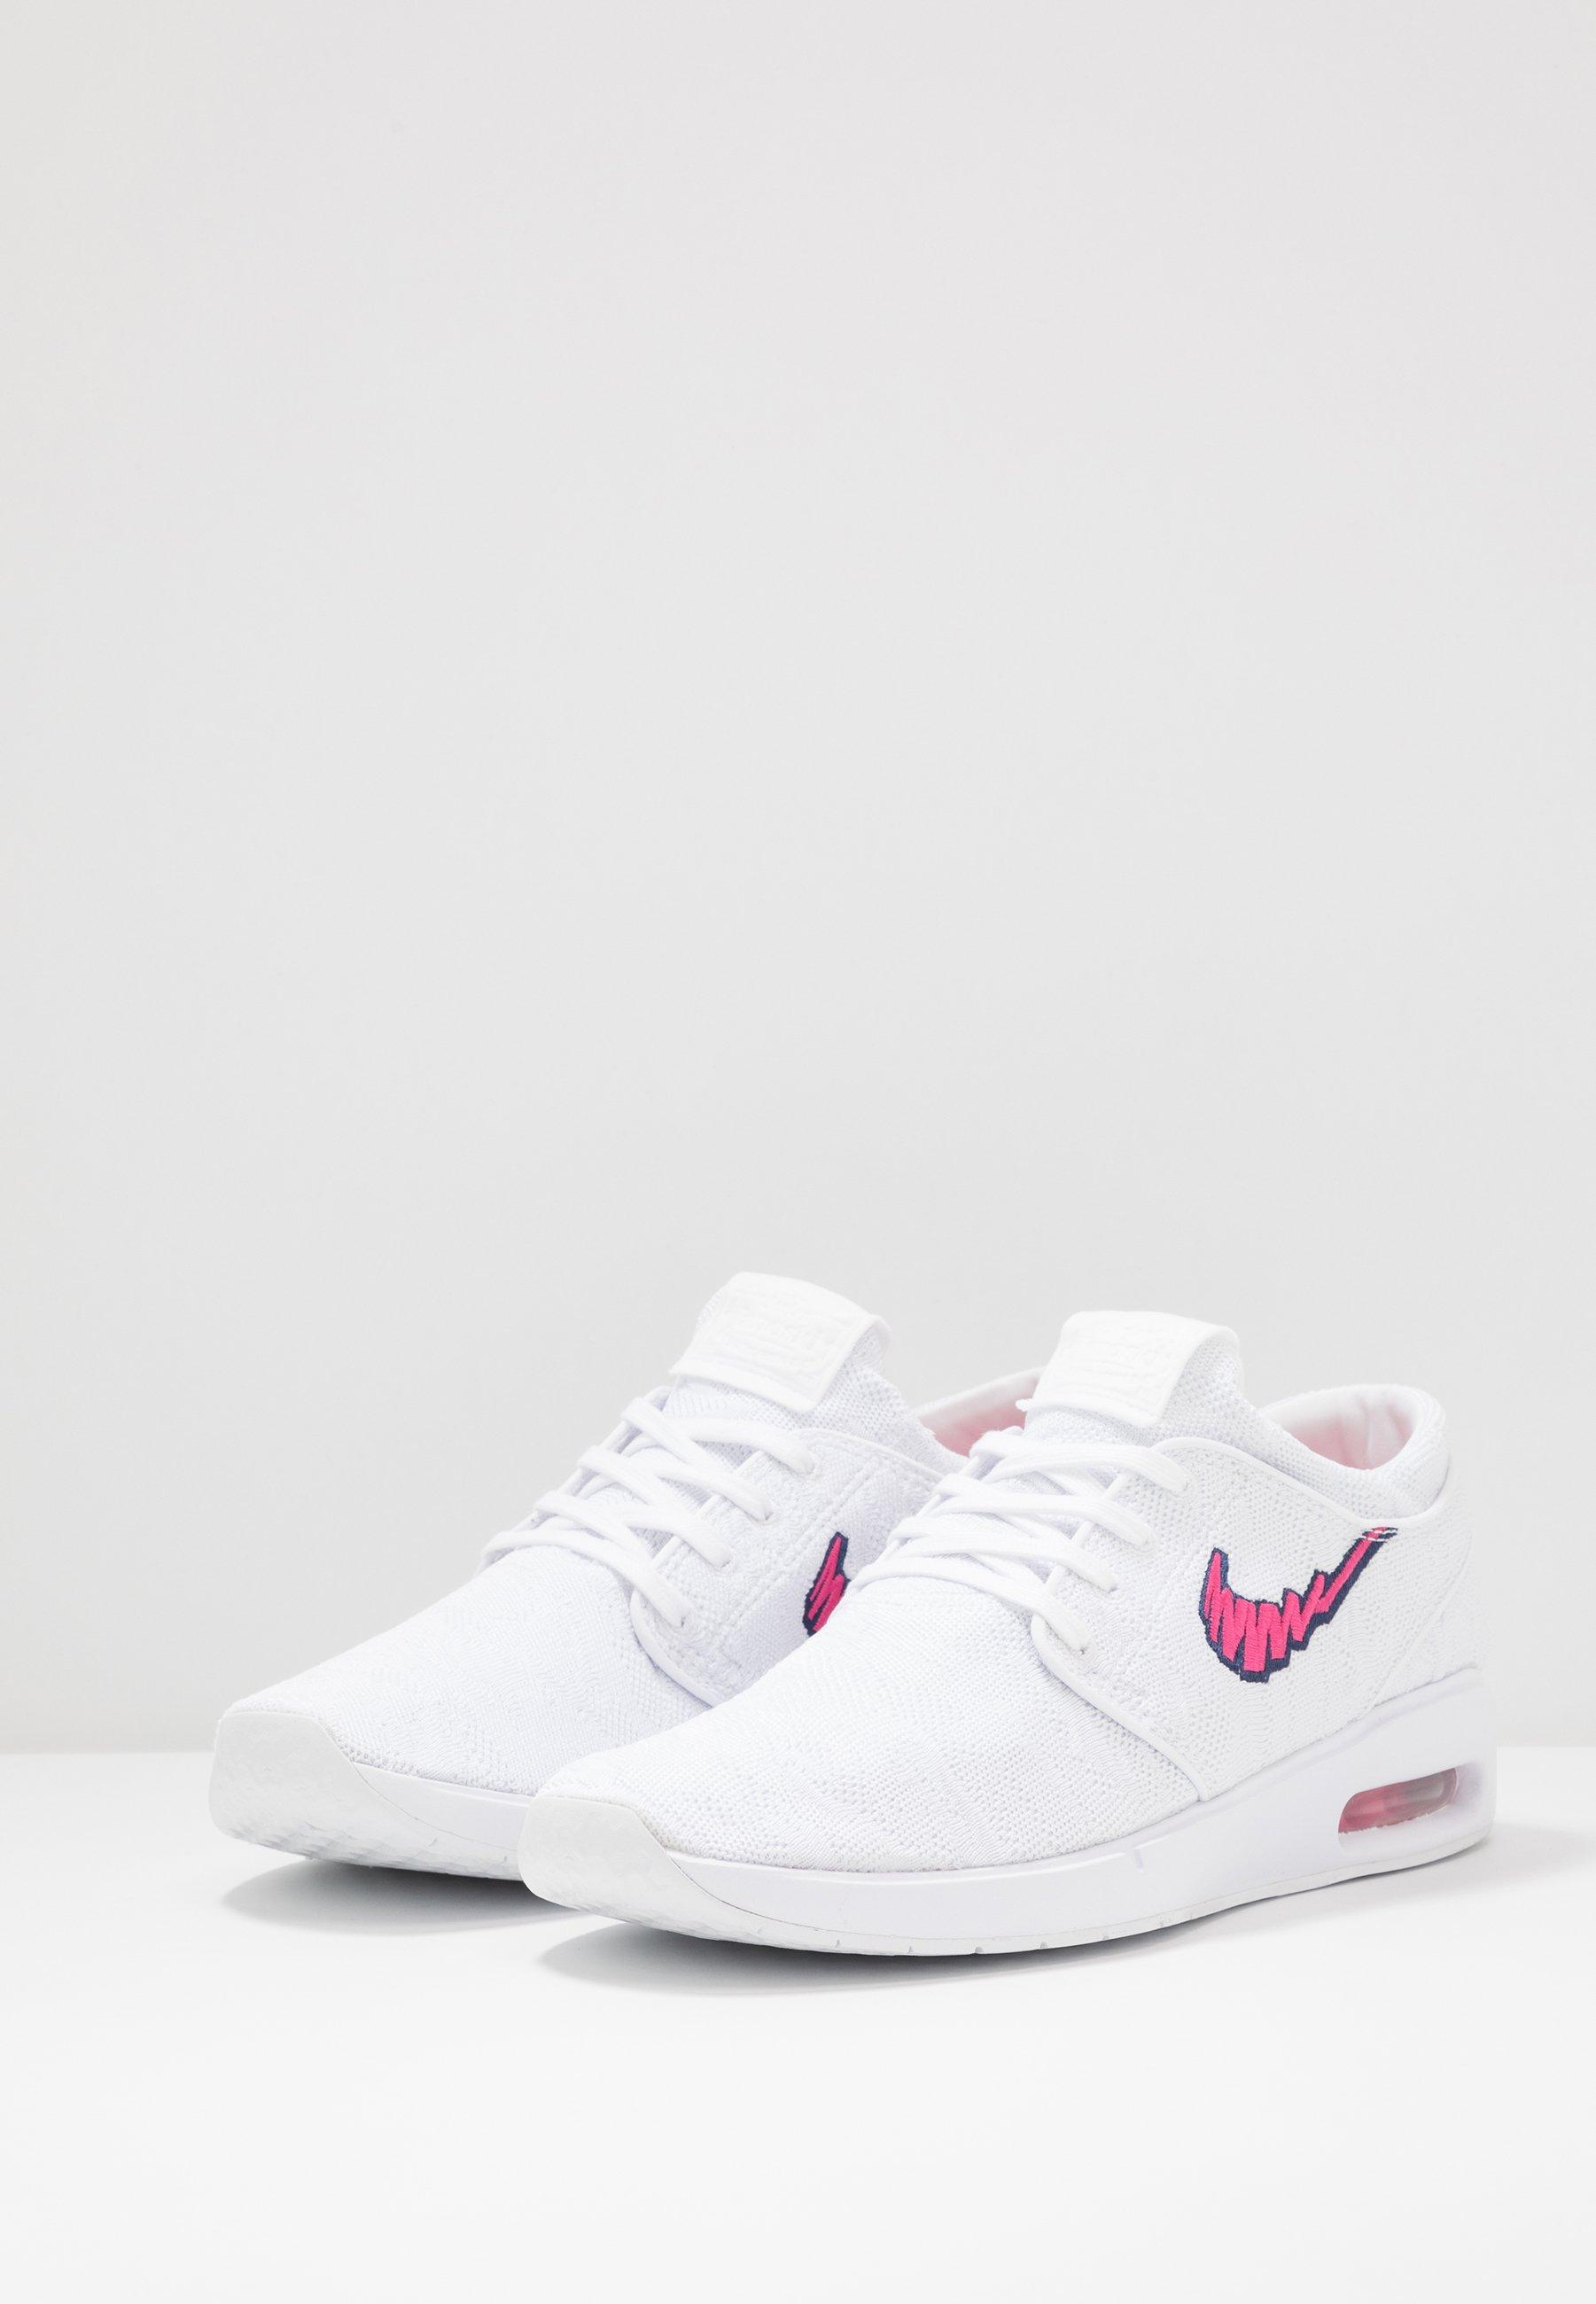 nike sb air max janoski 2 chaussures de fitness mixte adulte